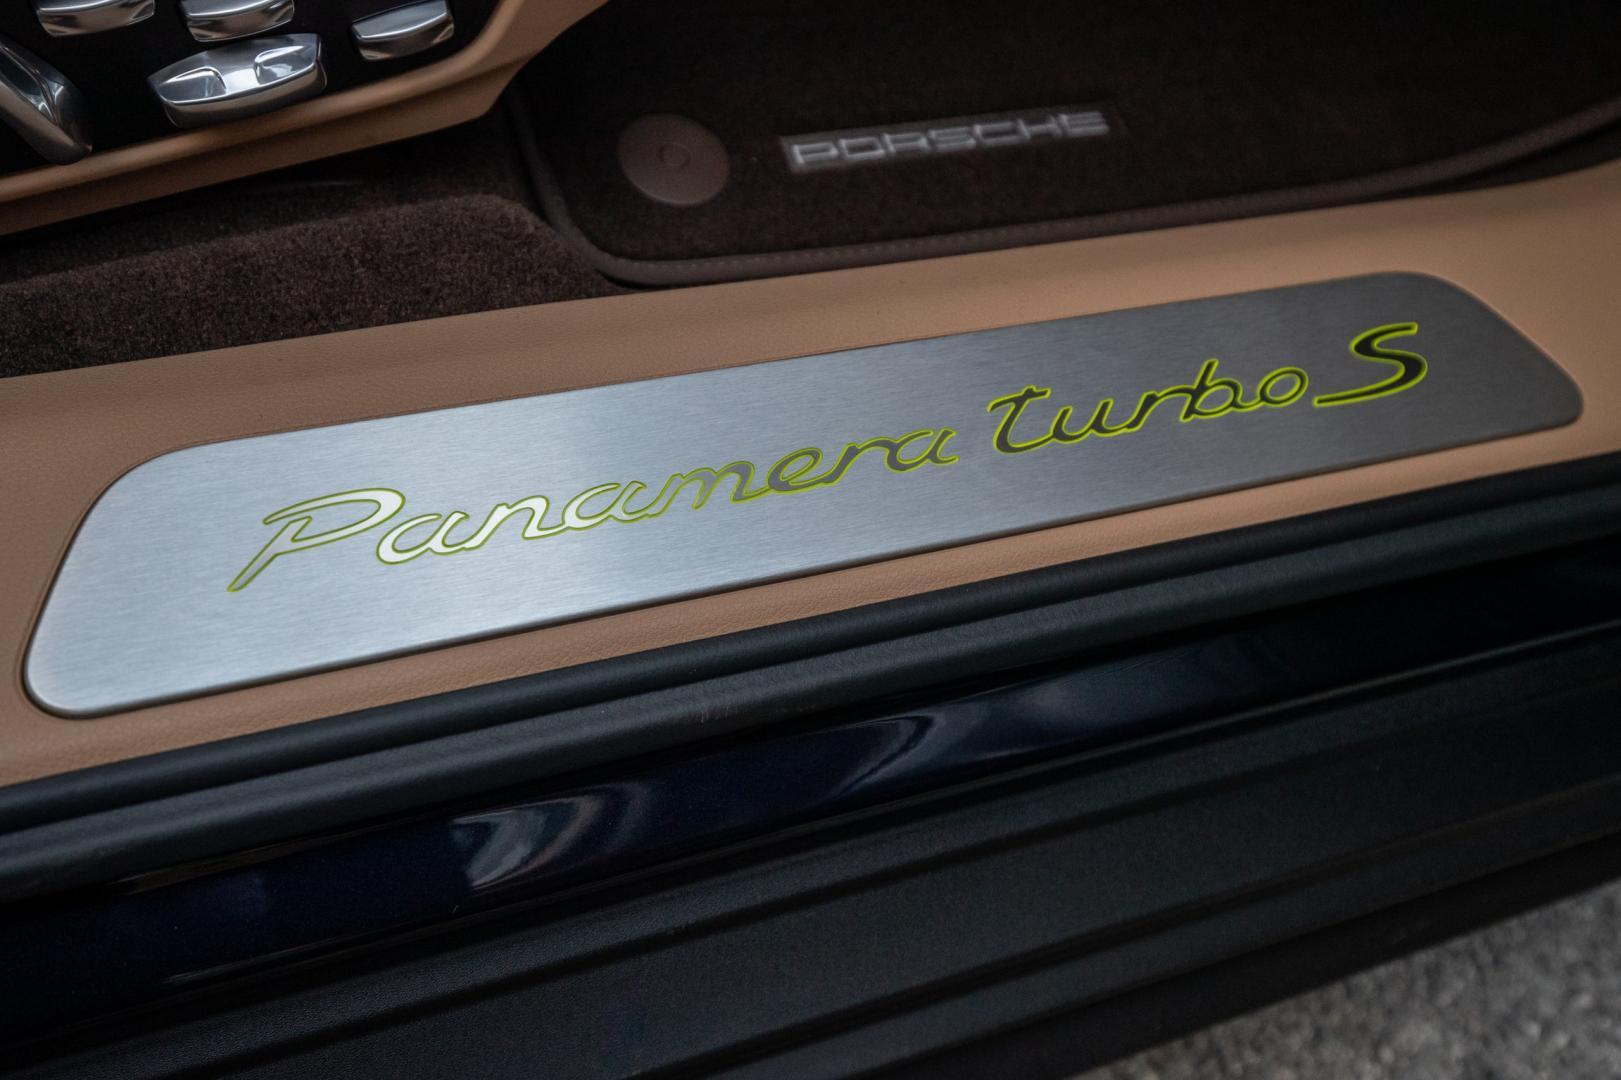 Deurlijst Porsche Panamera Turbo S E-Hybrid Sport Turismo